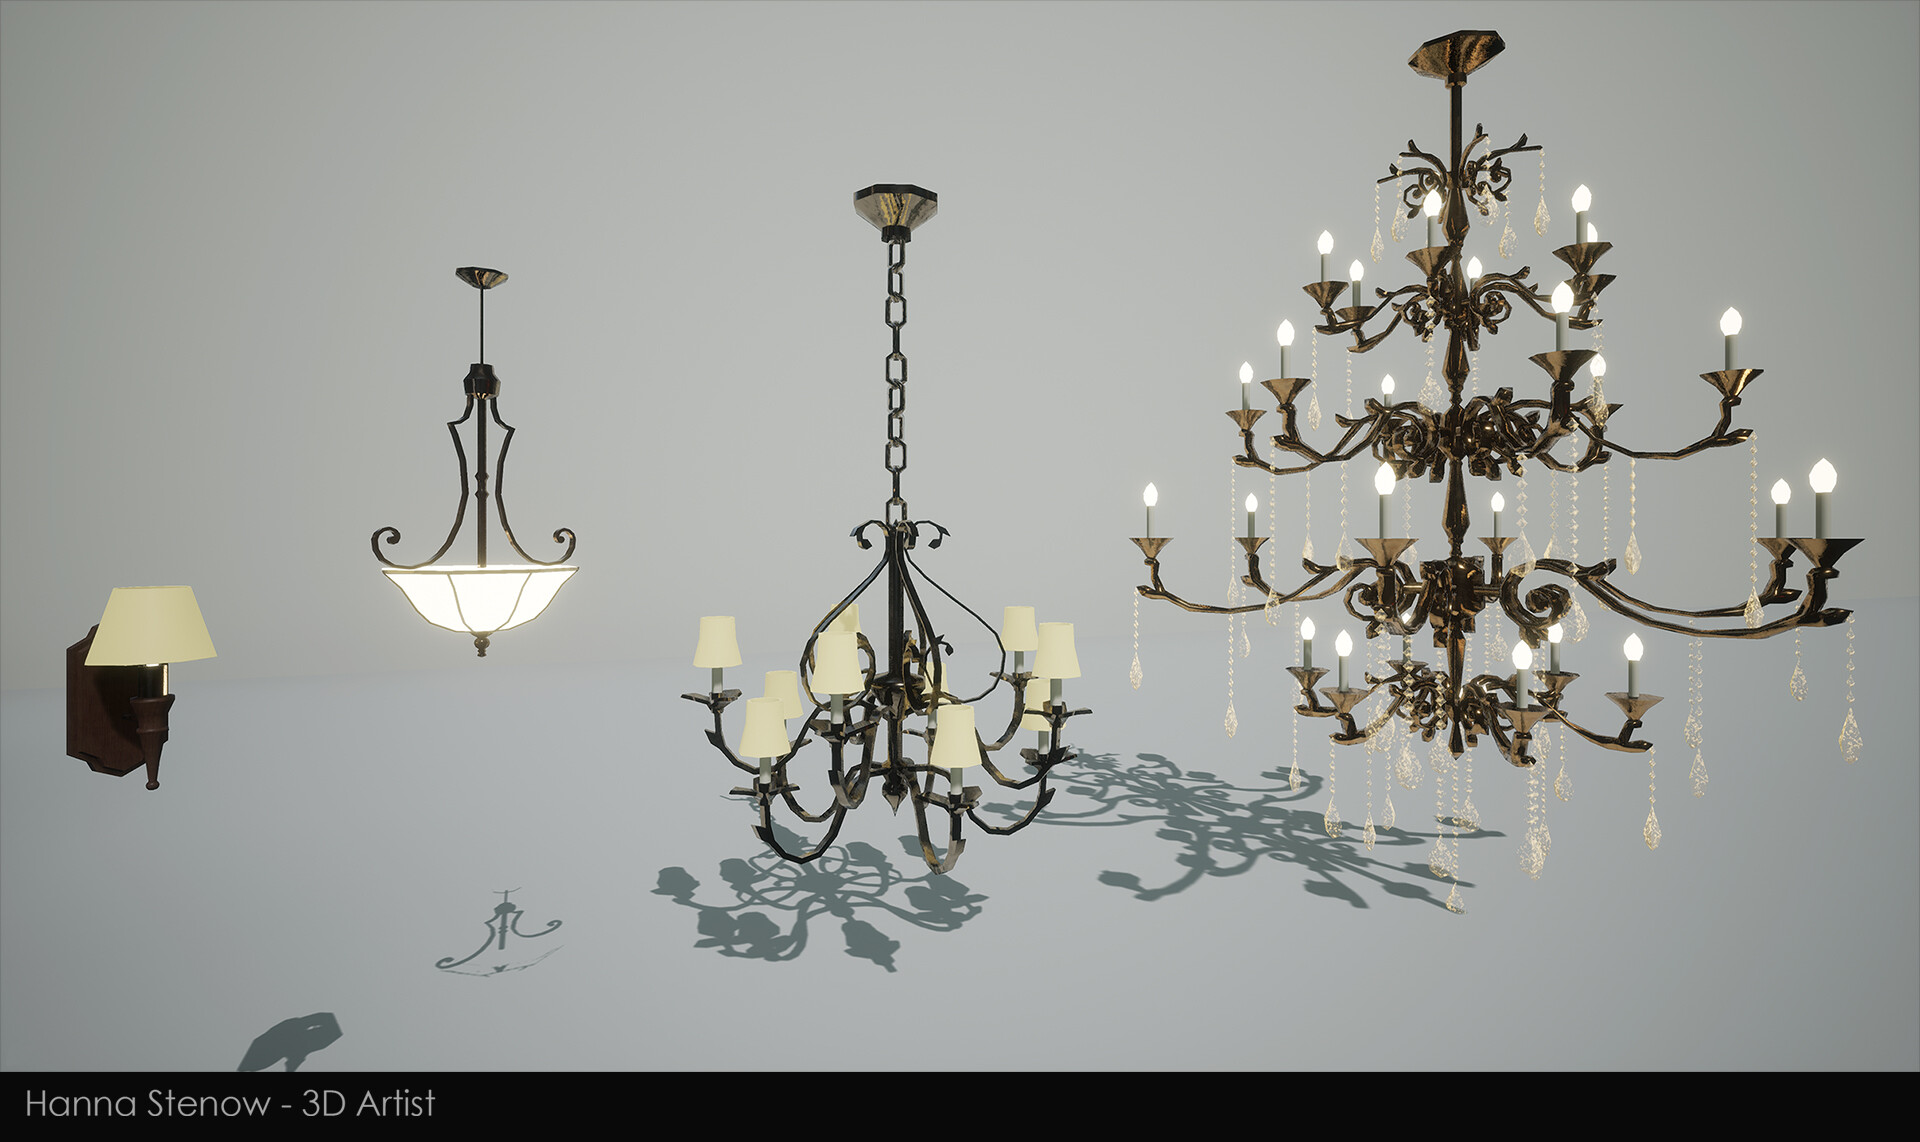 Hanna stenow lamps